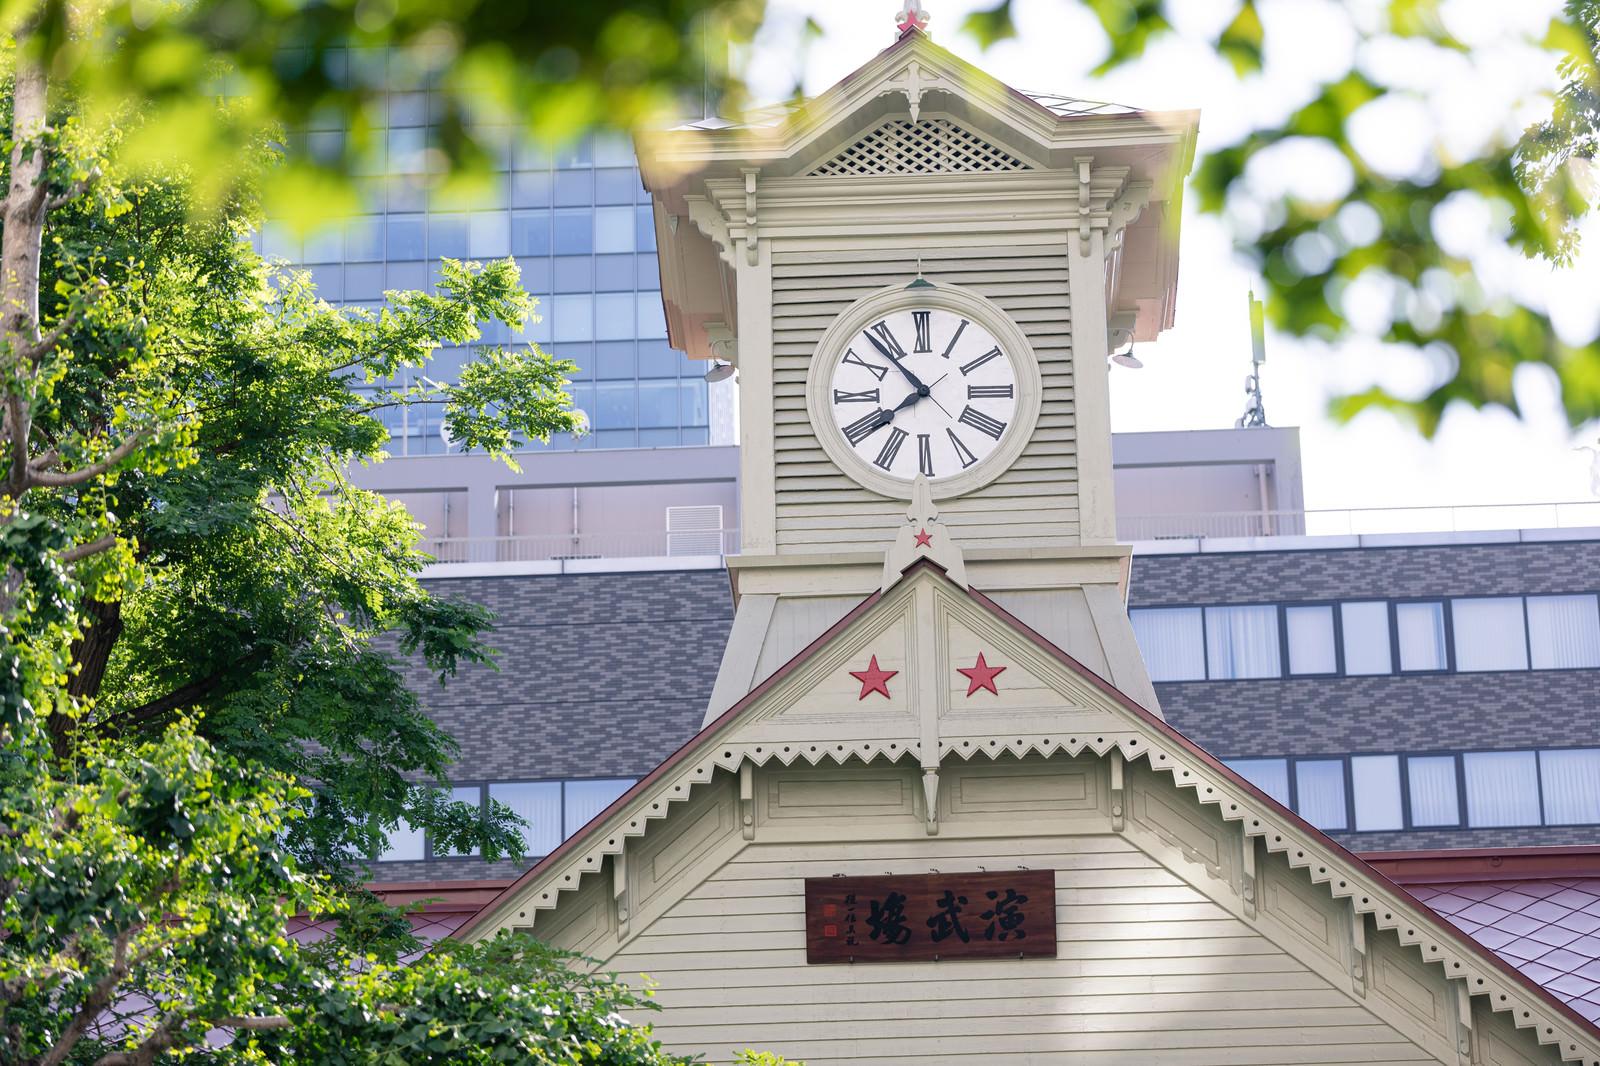 「木陰から見る札幌市時計台(北海道札幌市中央区)」の写真